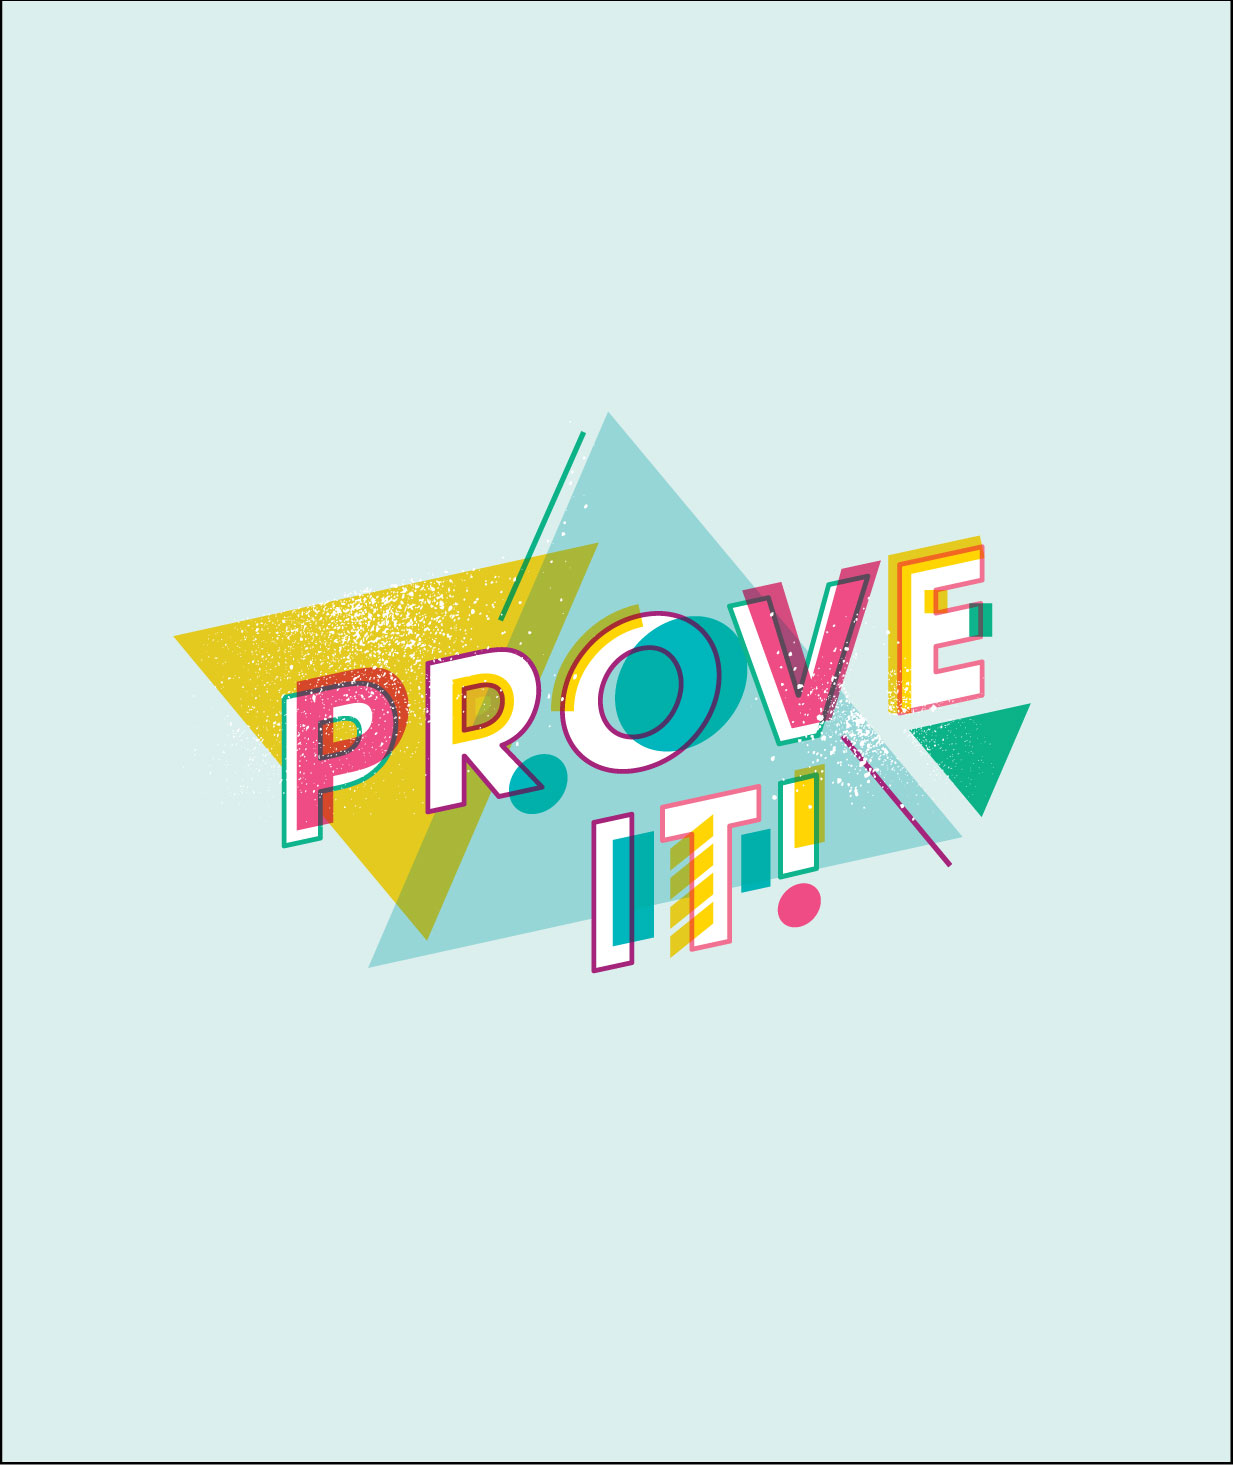 proveit-proof.jpg